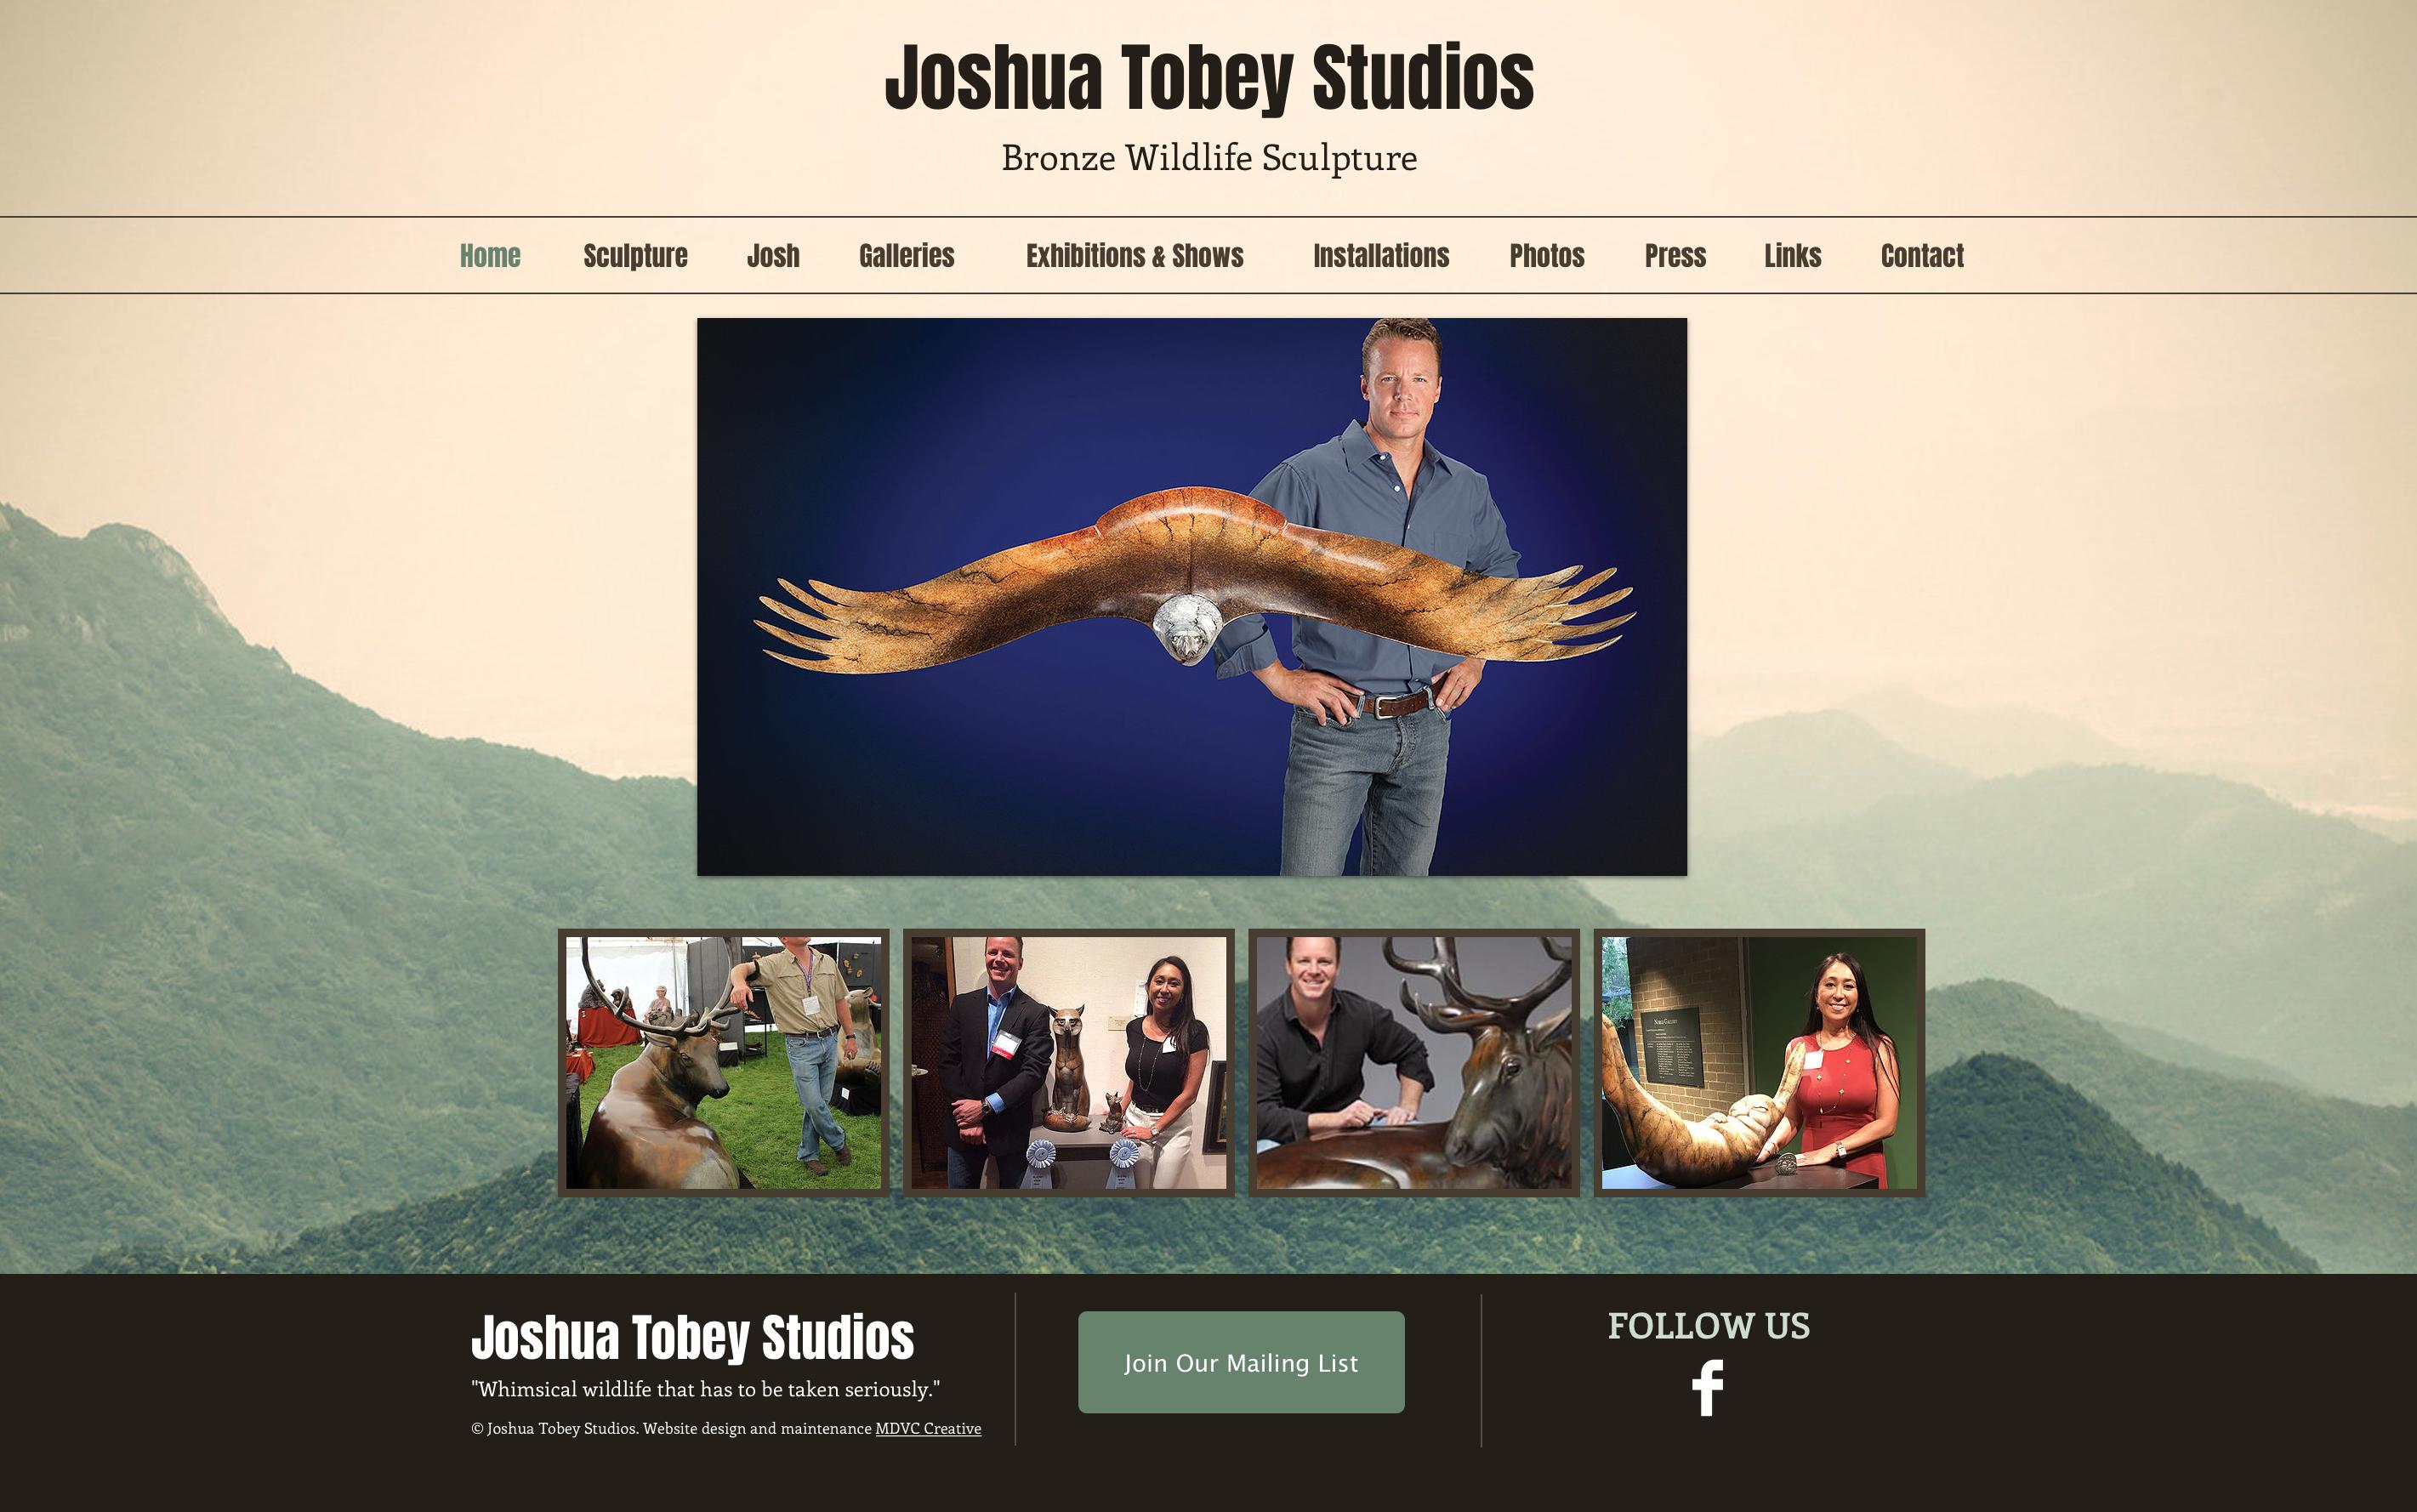 Joshua Tobey Studios